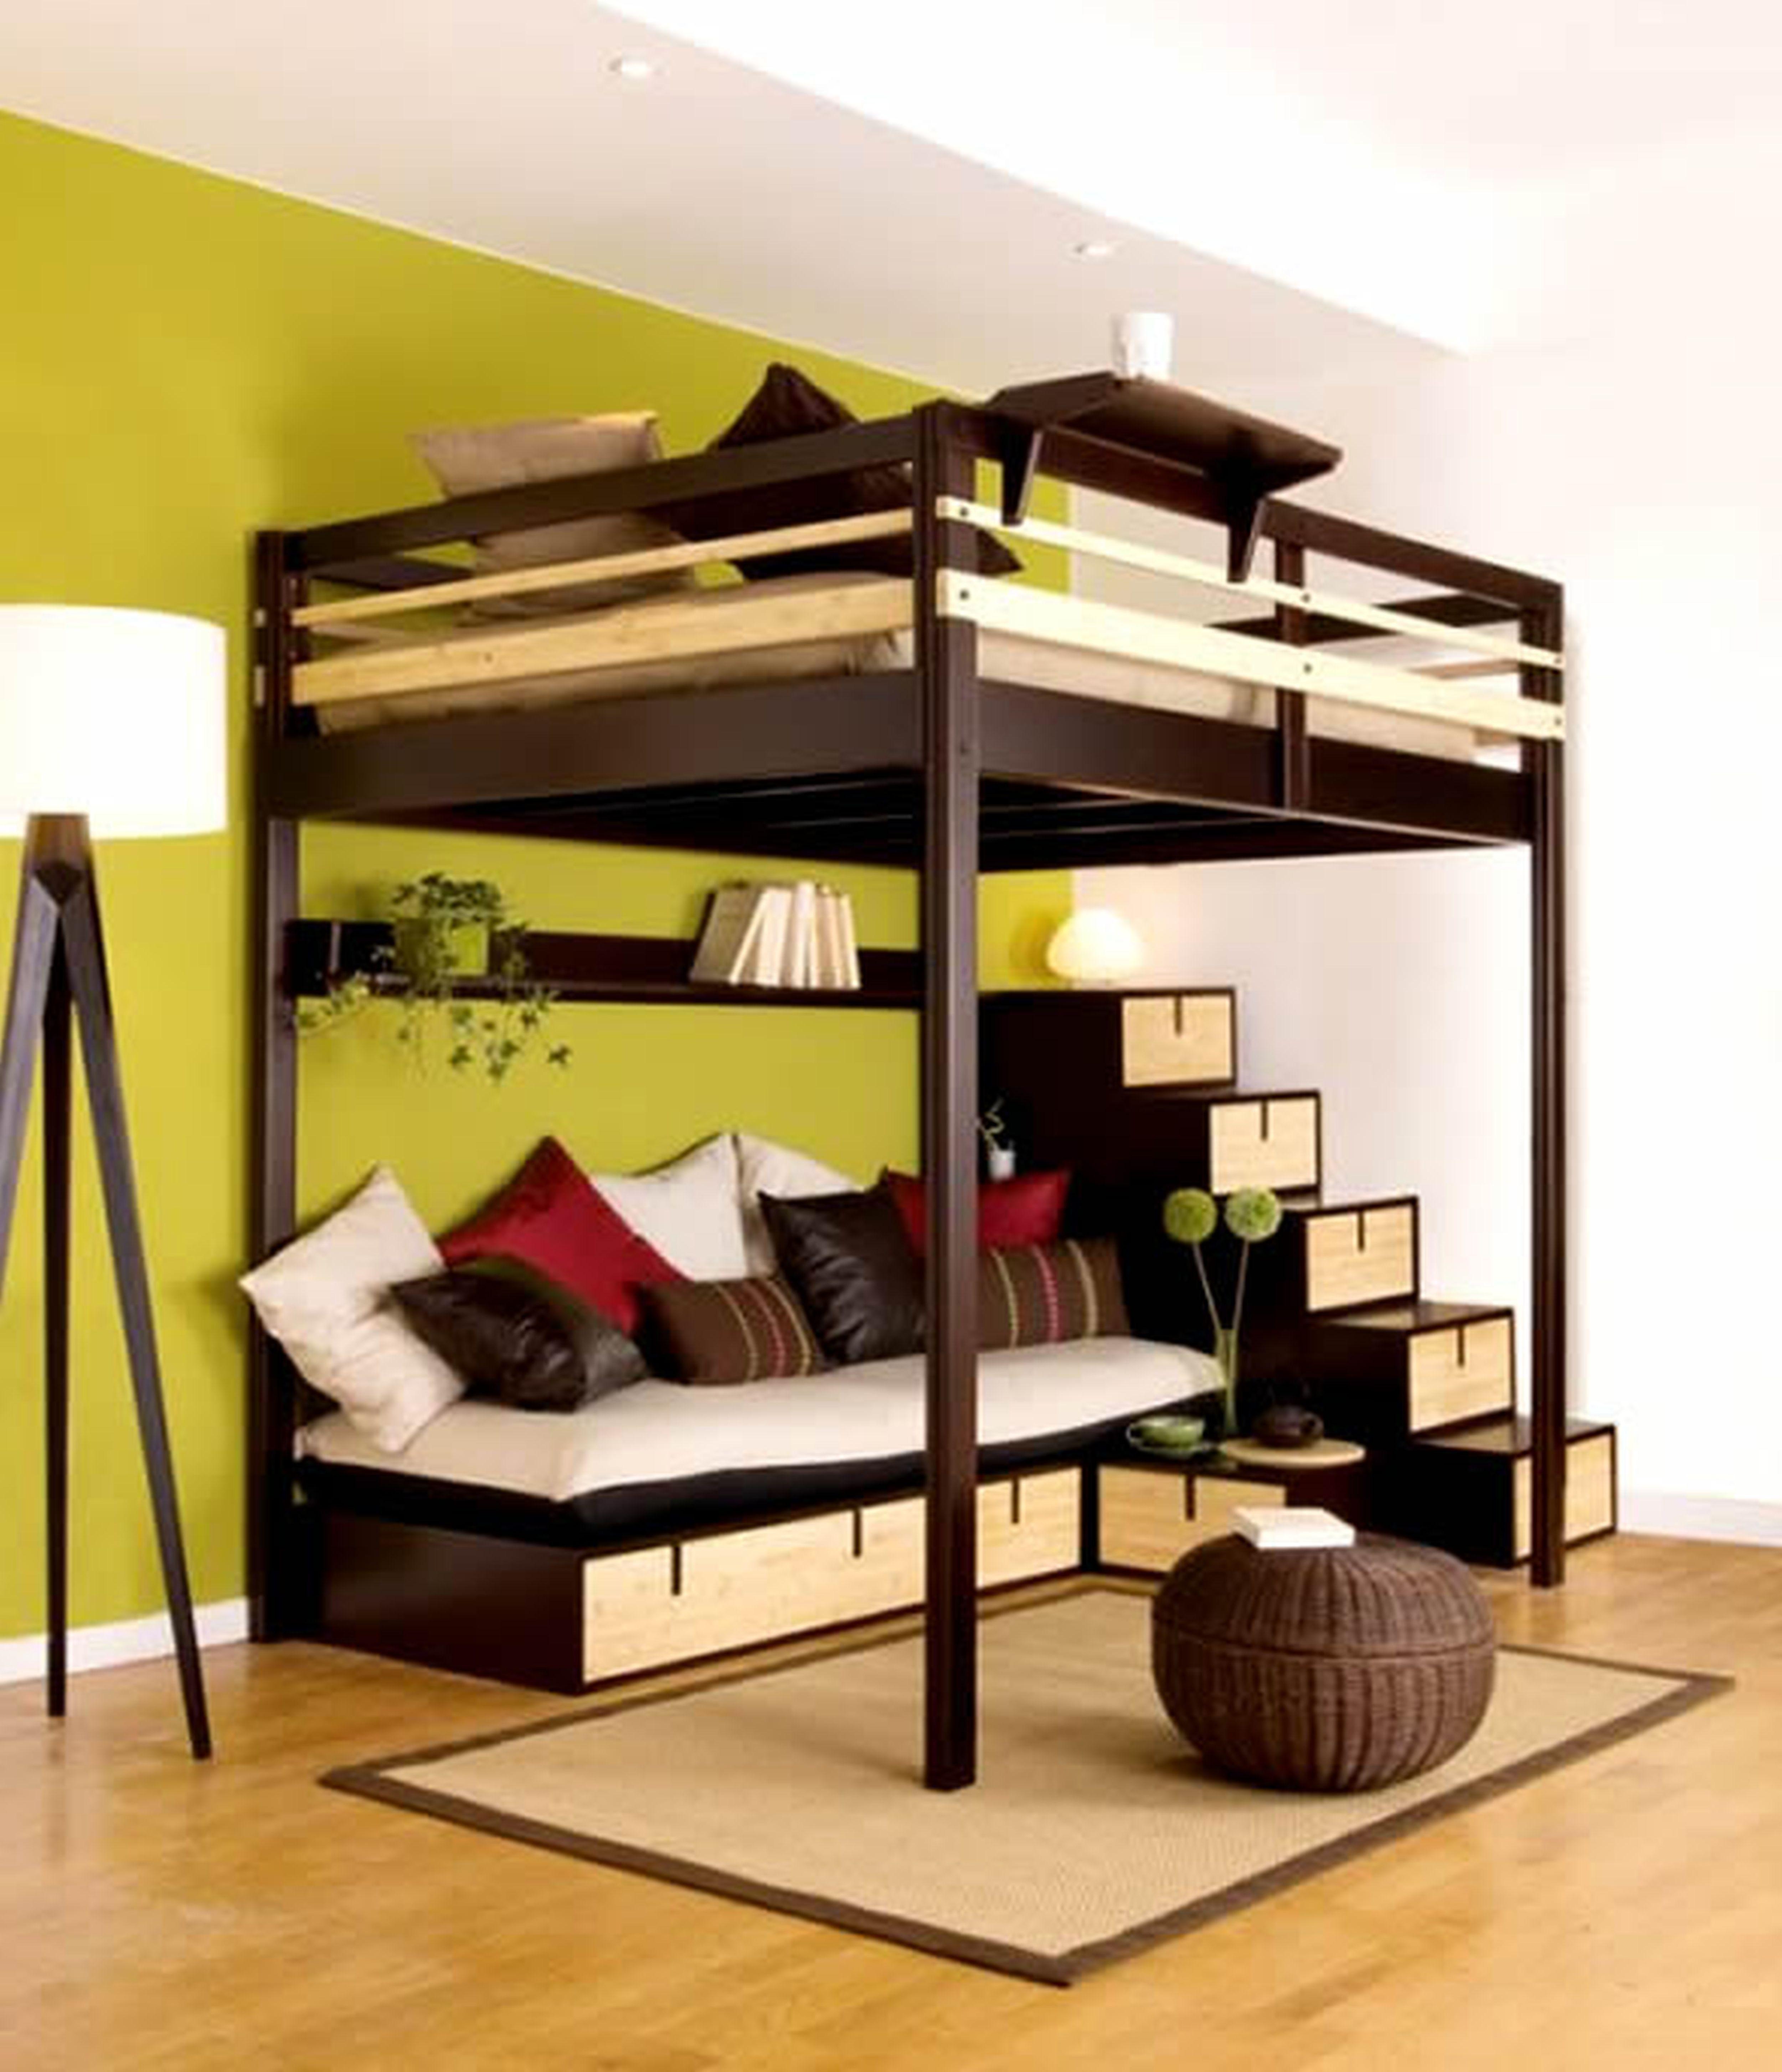 interior design for small room - Diy teenage girls bedroom decorating ideas attic oasis bedroom ...